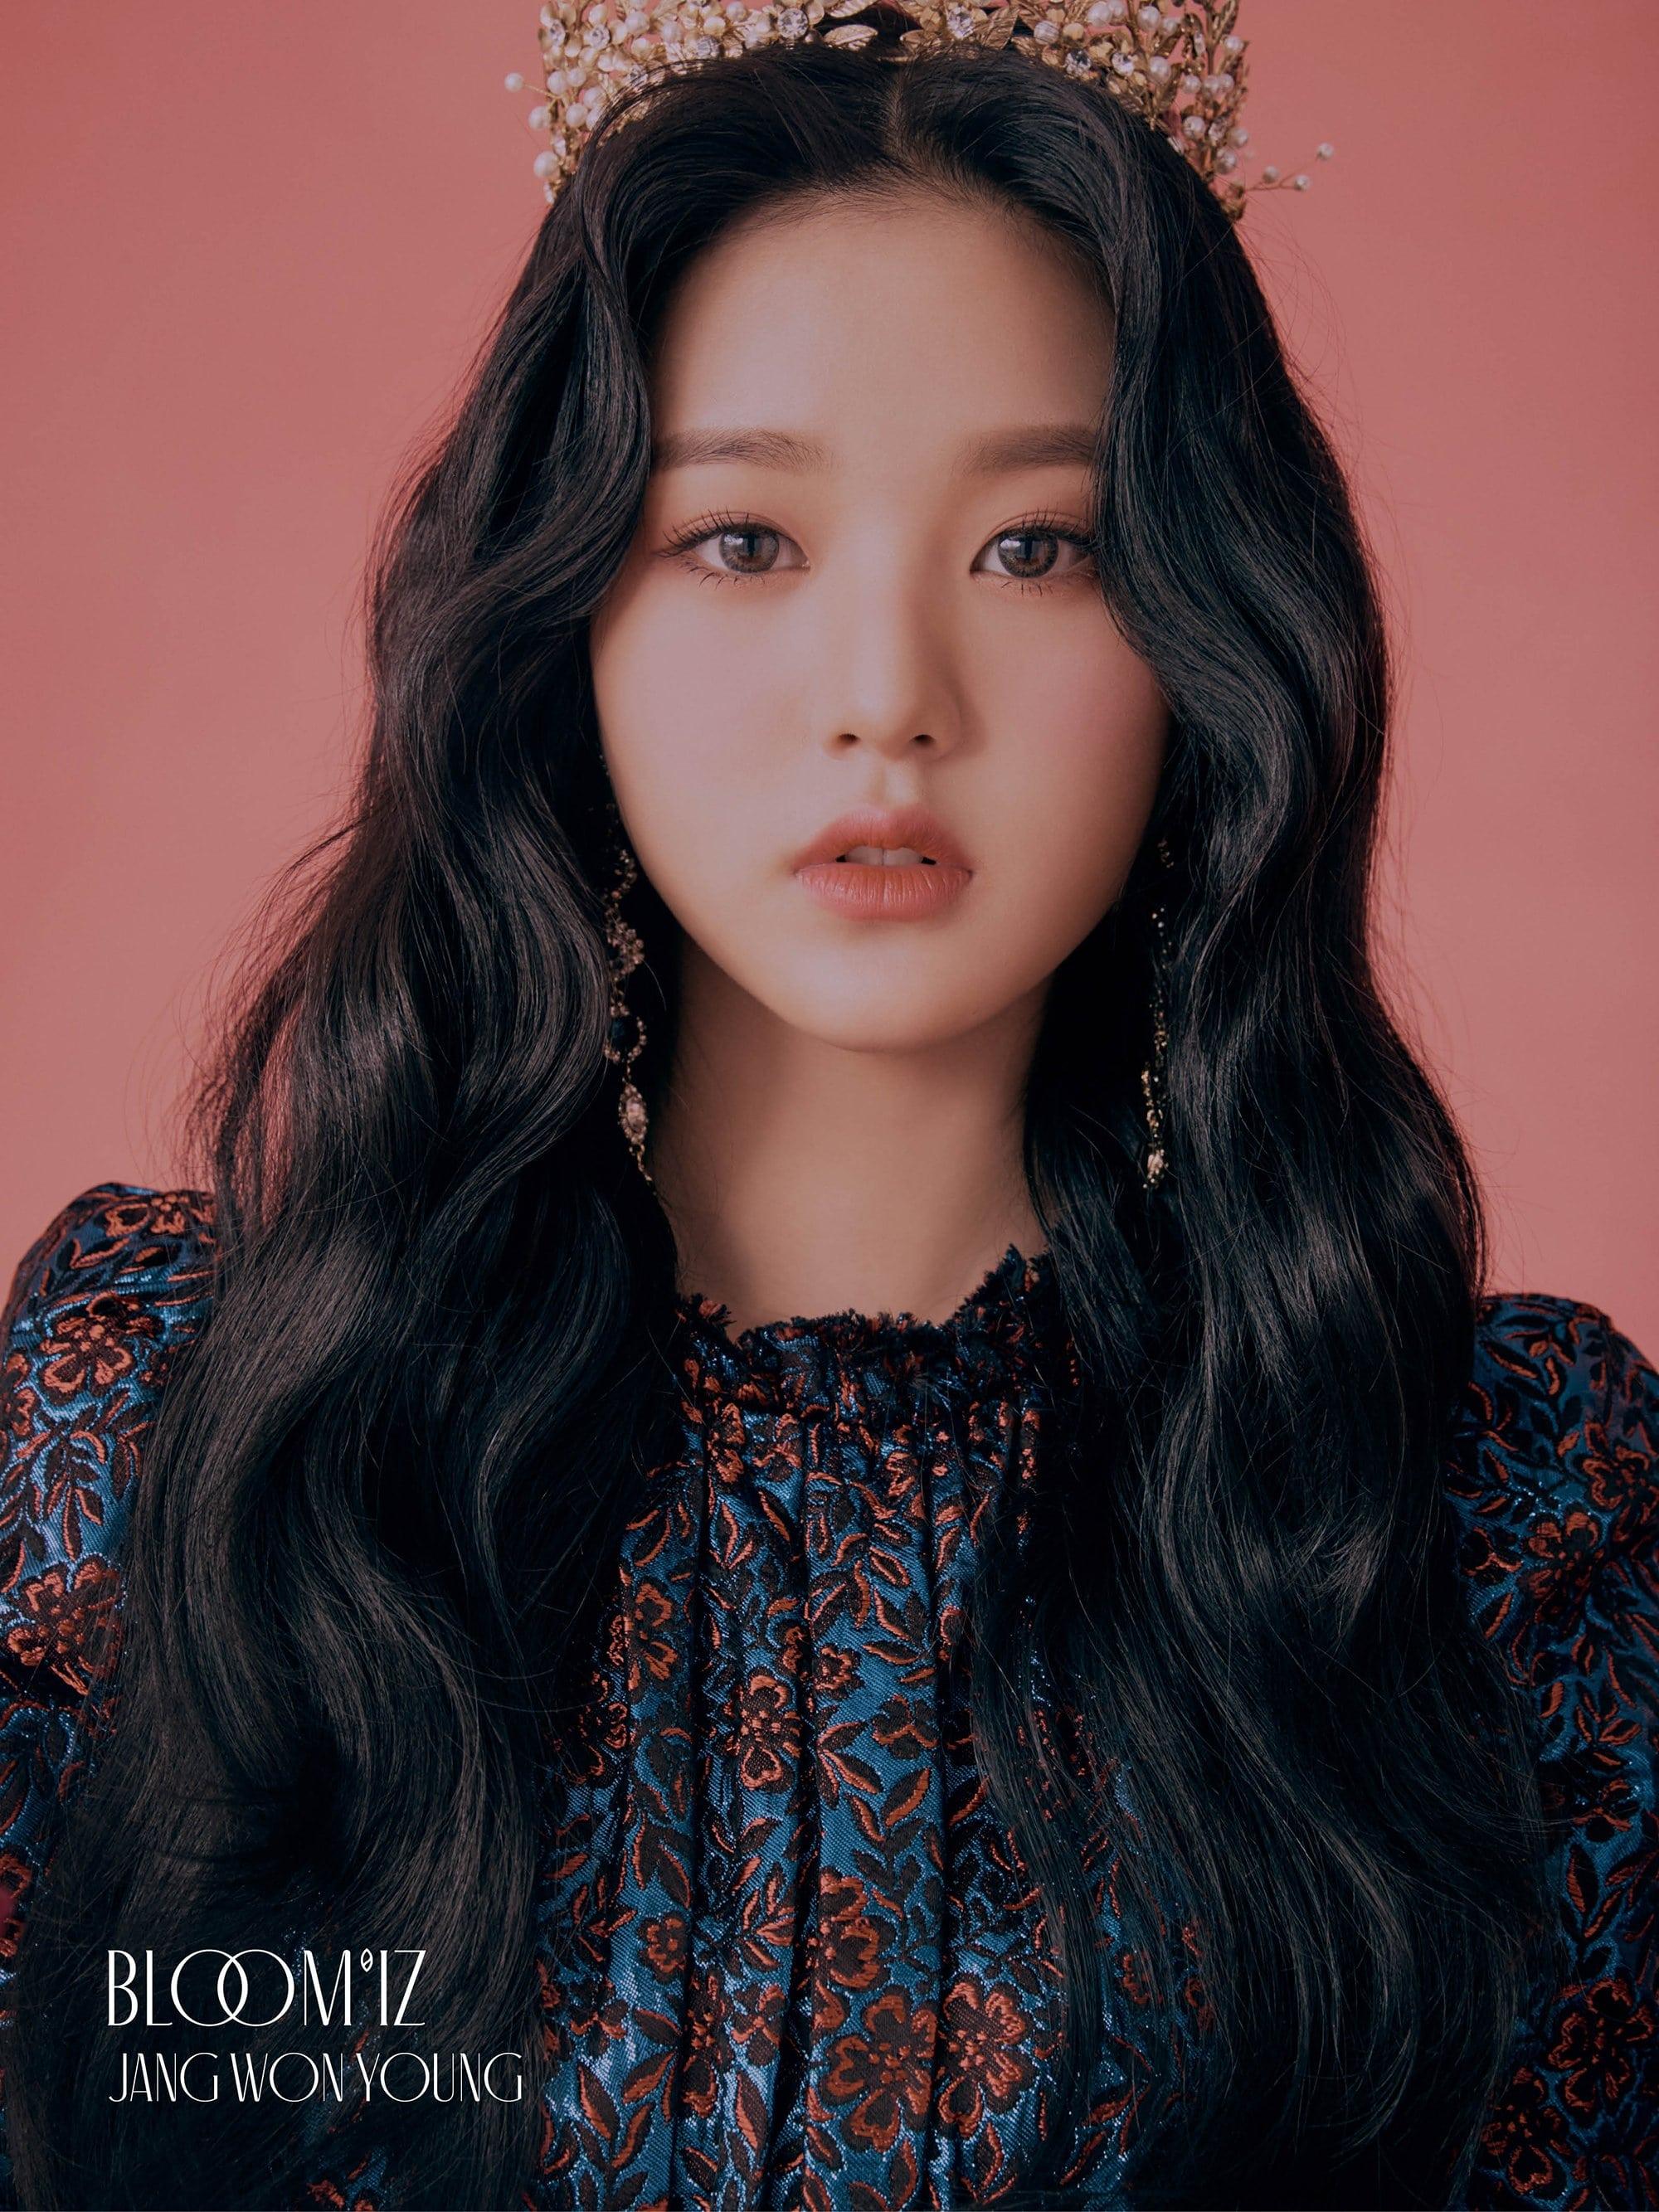 Jang Wonyoung | Produce 101 Wikia | Fandom